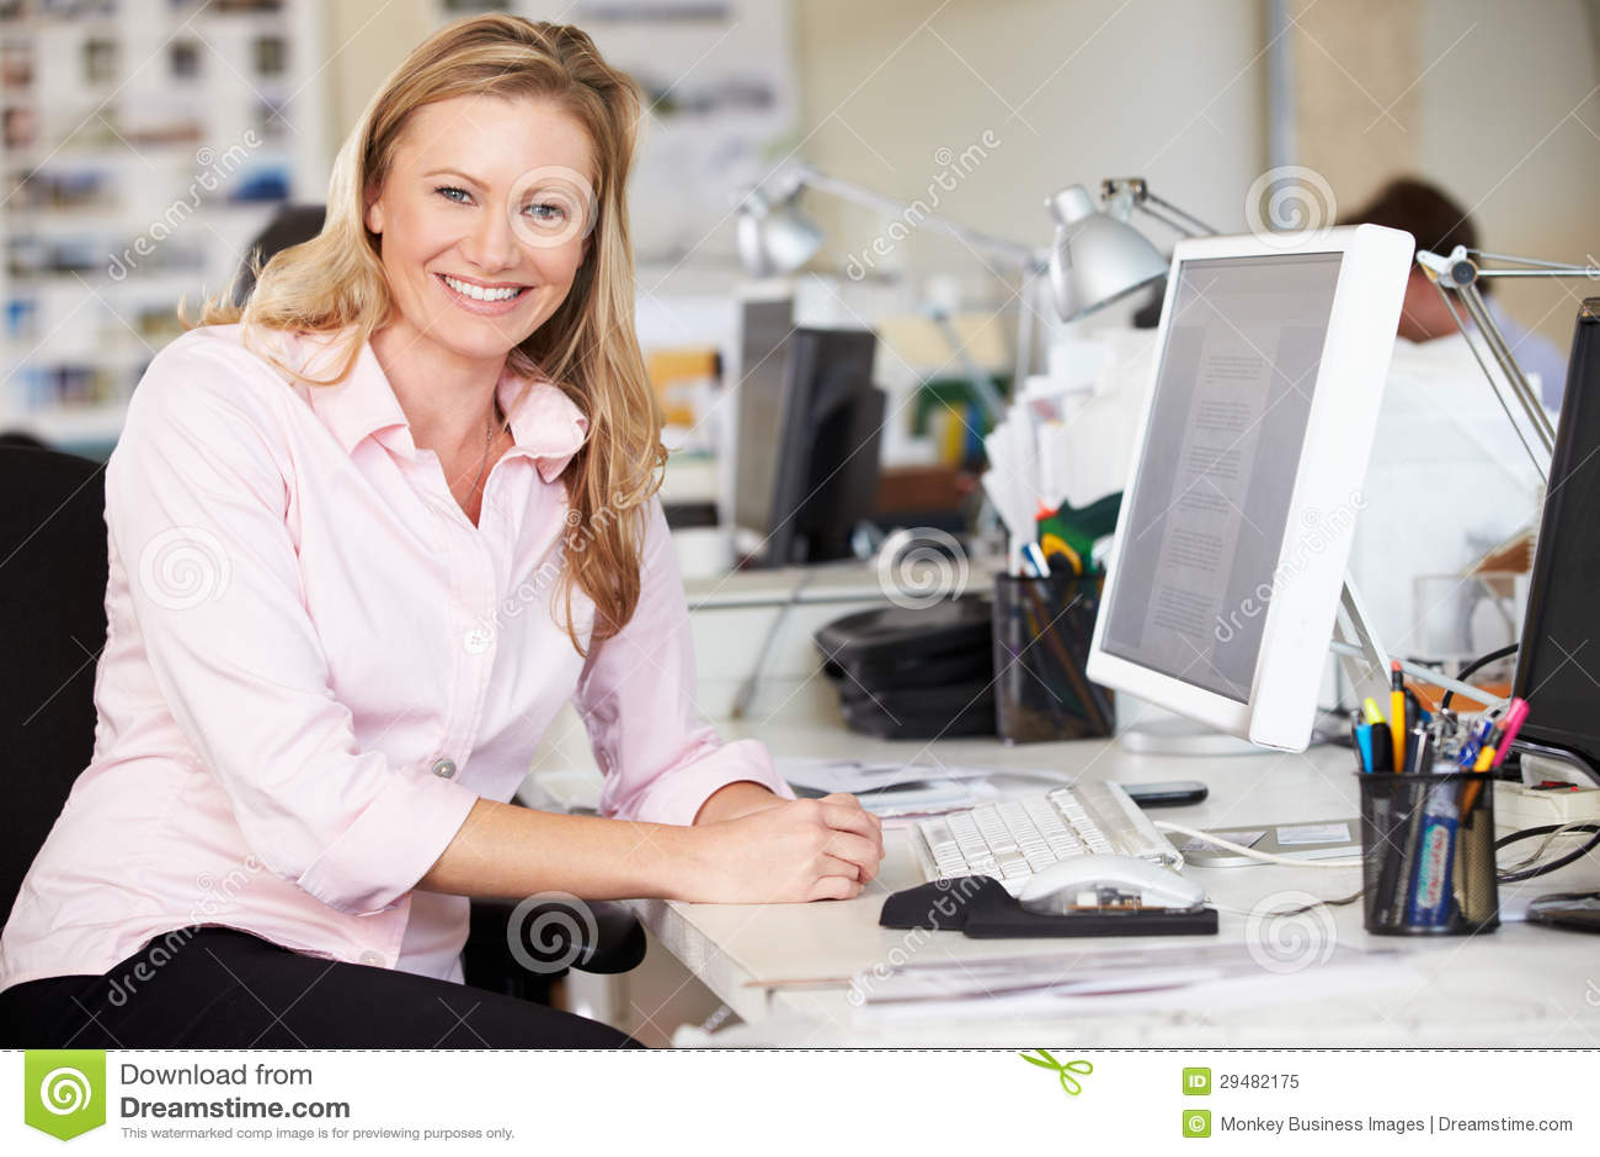 Femme travaillant au bureau dans le bureau créatif occupé